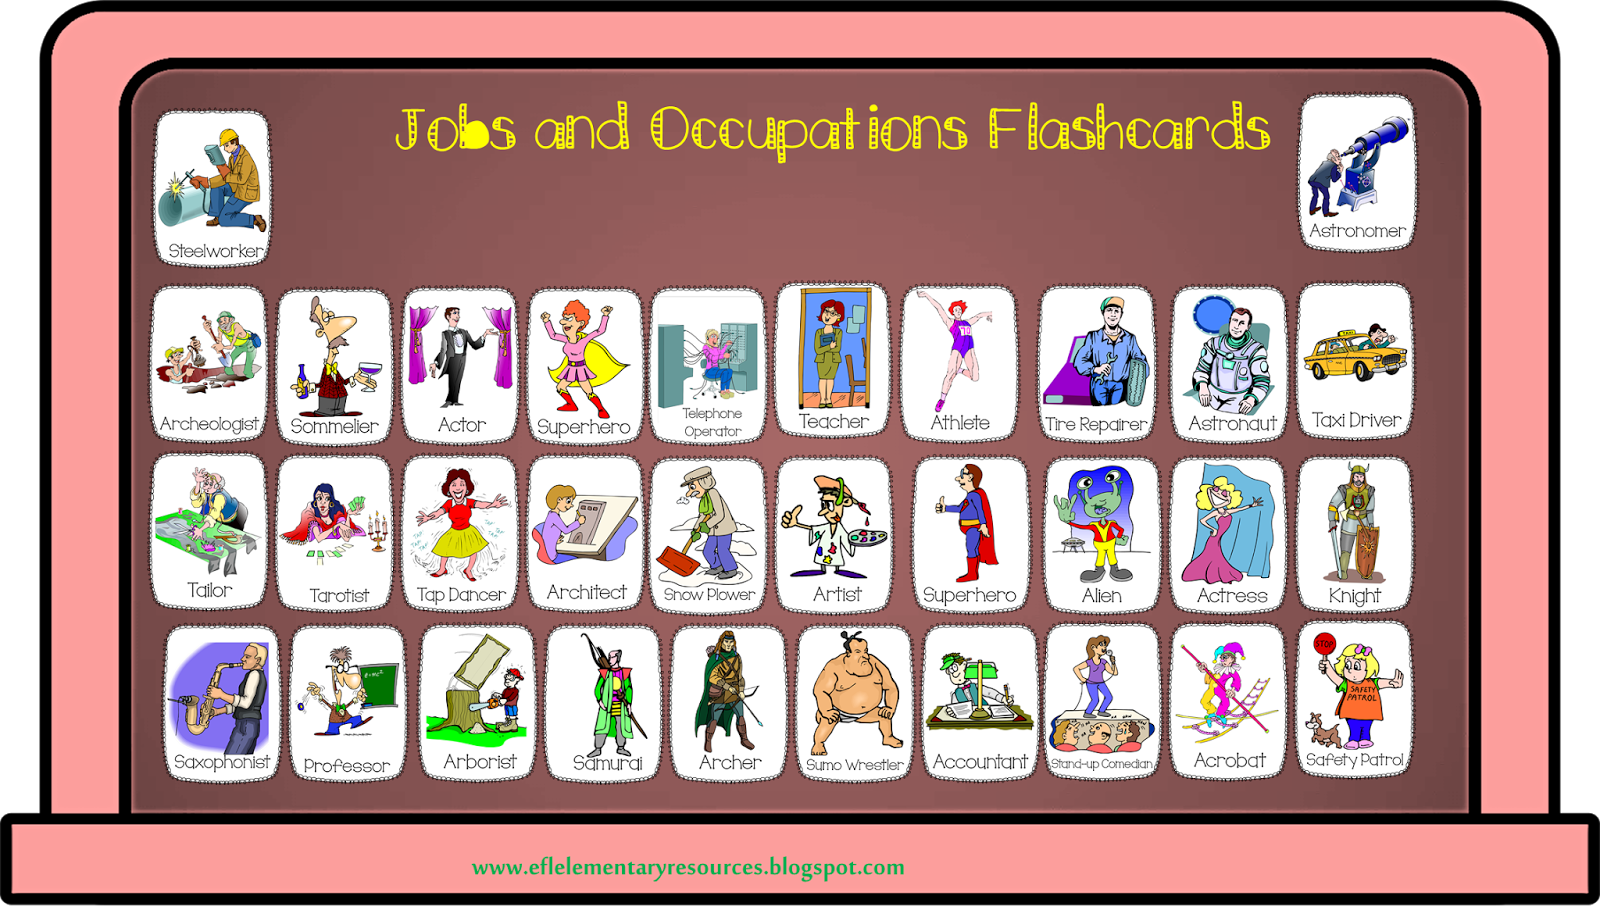 Efl Elementary Teachers Community Helpers Jobs And